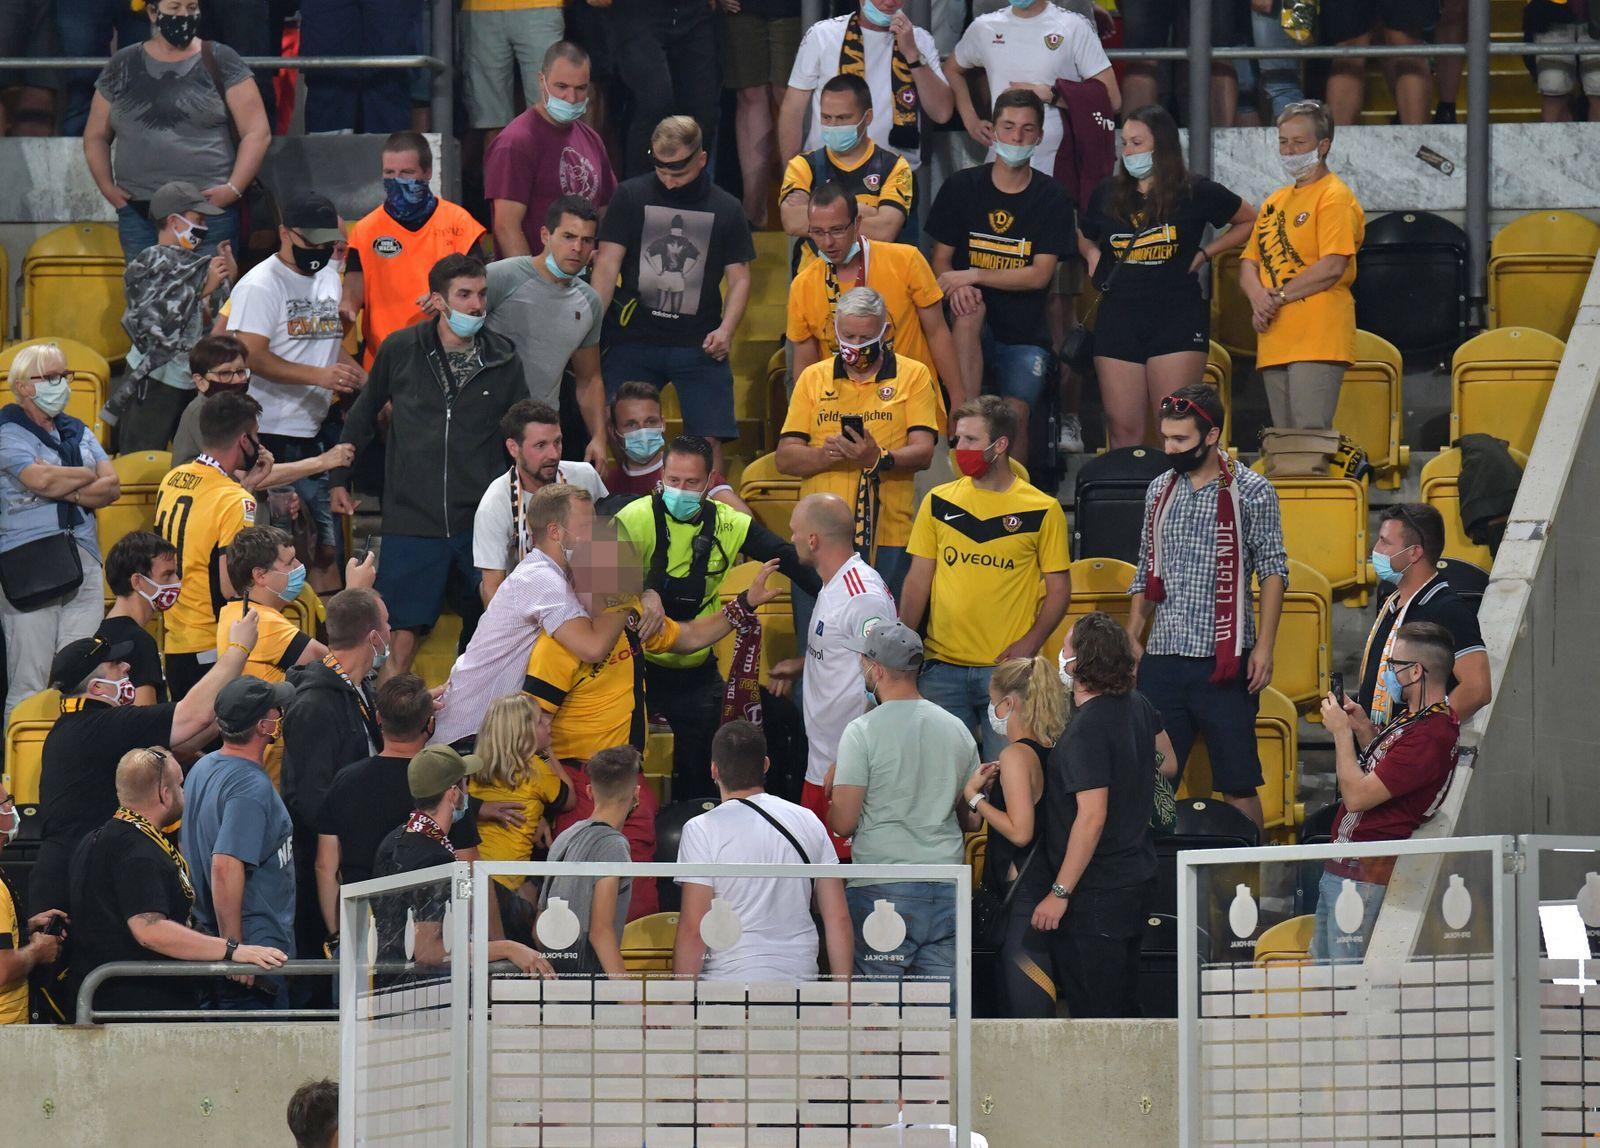 14.09.2020, xblx, Fussball DFB Pokal 1.Runde, Dynamo Dresden - Hamburger SV emspor, v.l. Toni Leistner (Hamburger SV) h